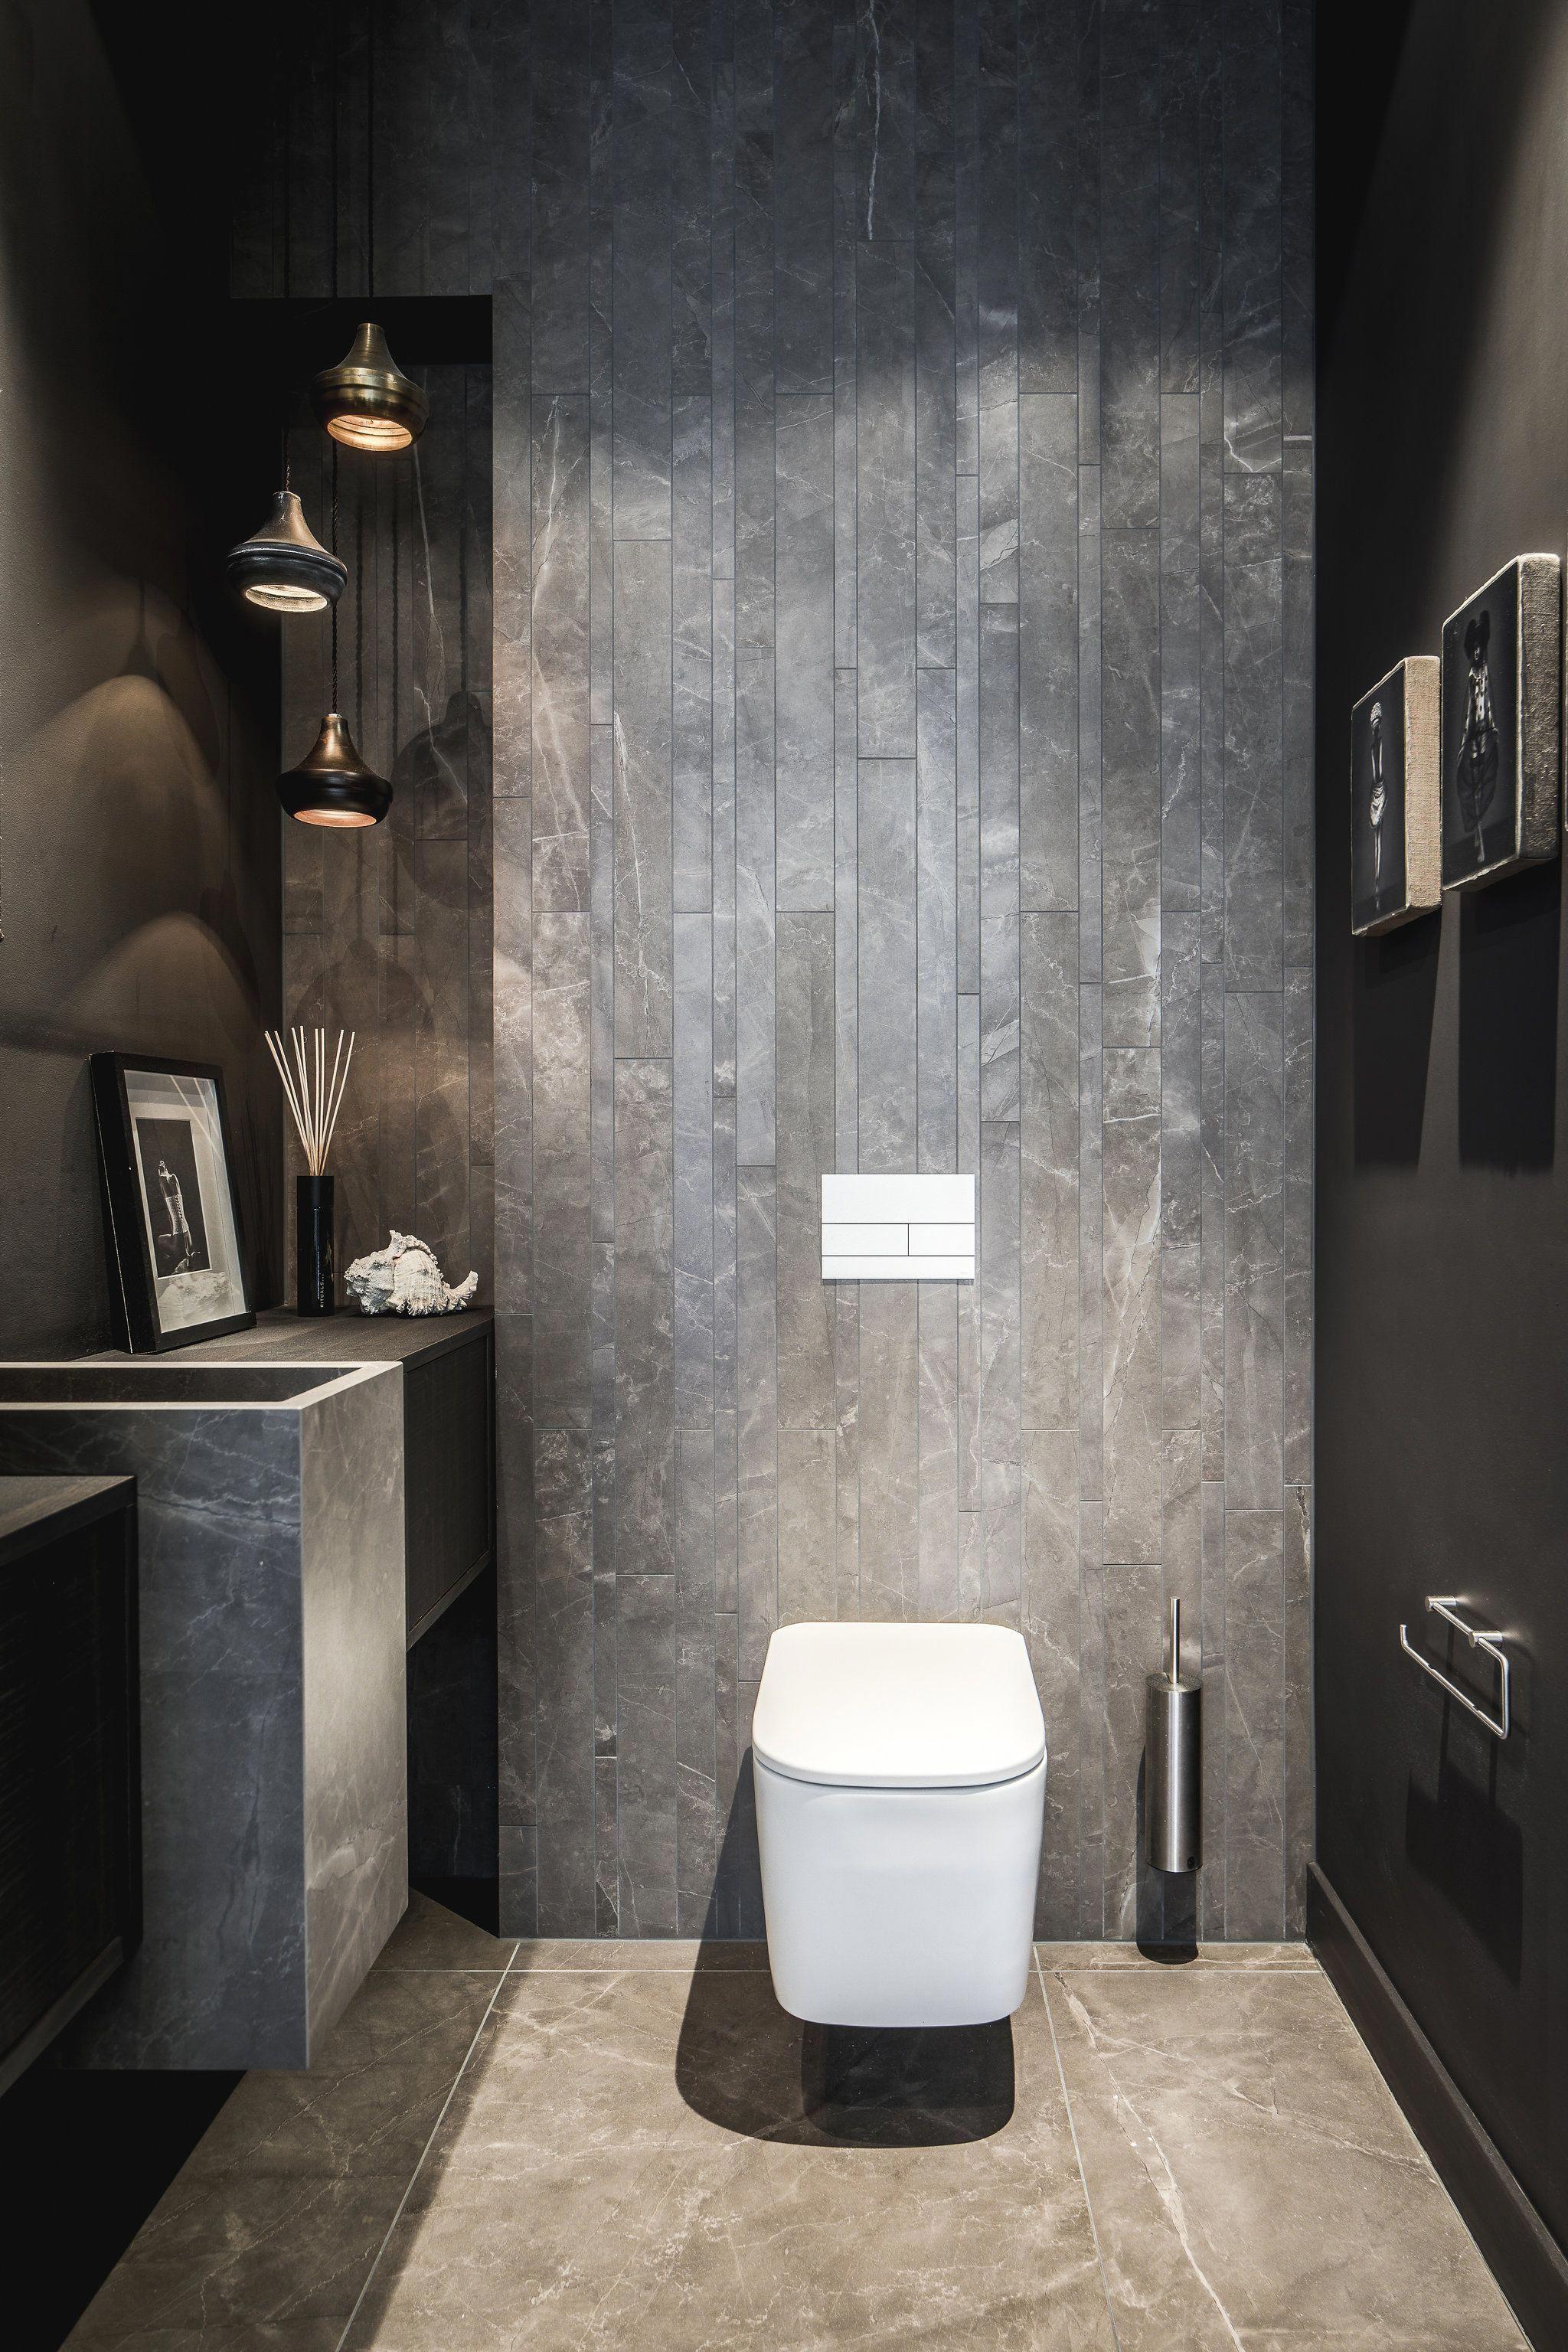 Dark Bathroom Tile Darkbathroomwalls Toilet Design Bathroom Interior Design Shabby Chic Bathroom